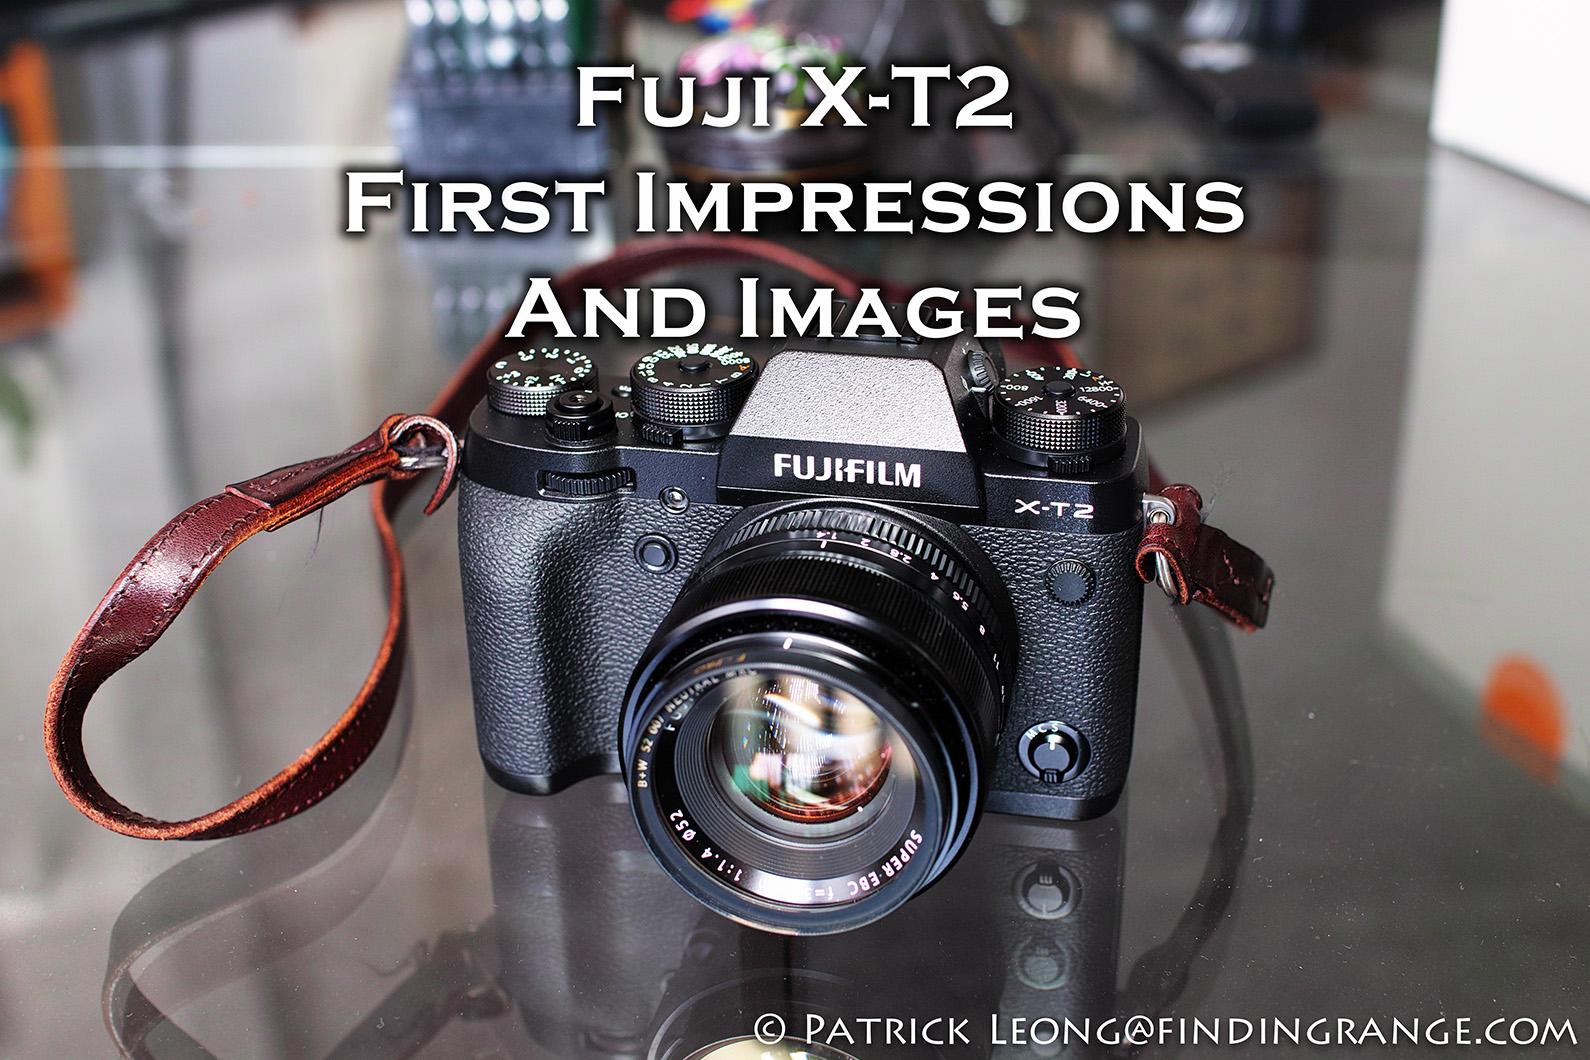 fuji-x-t2-review-first-impressions-4